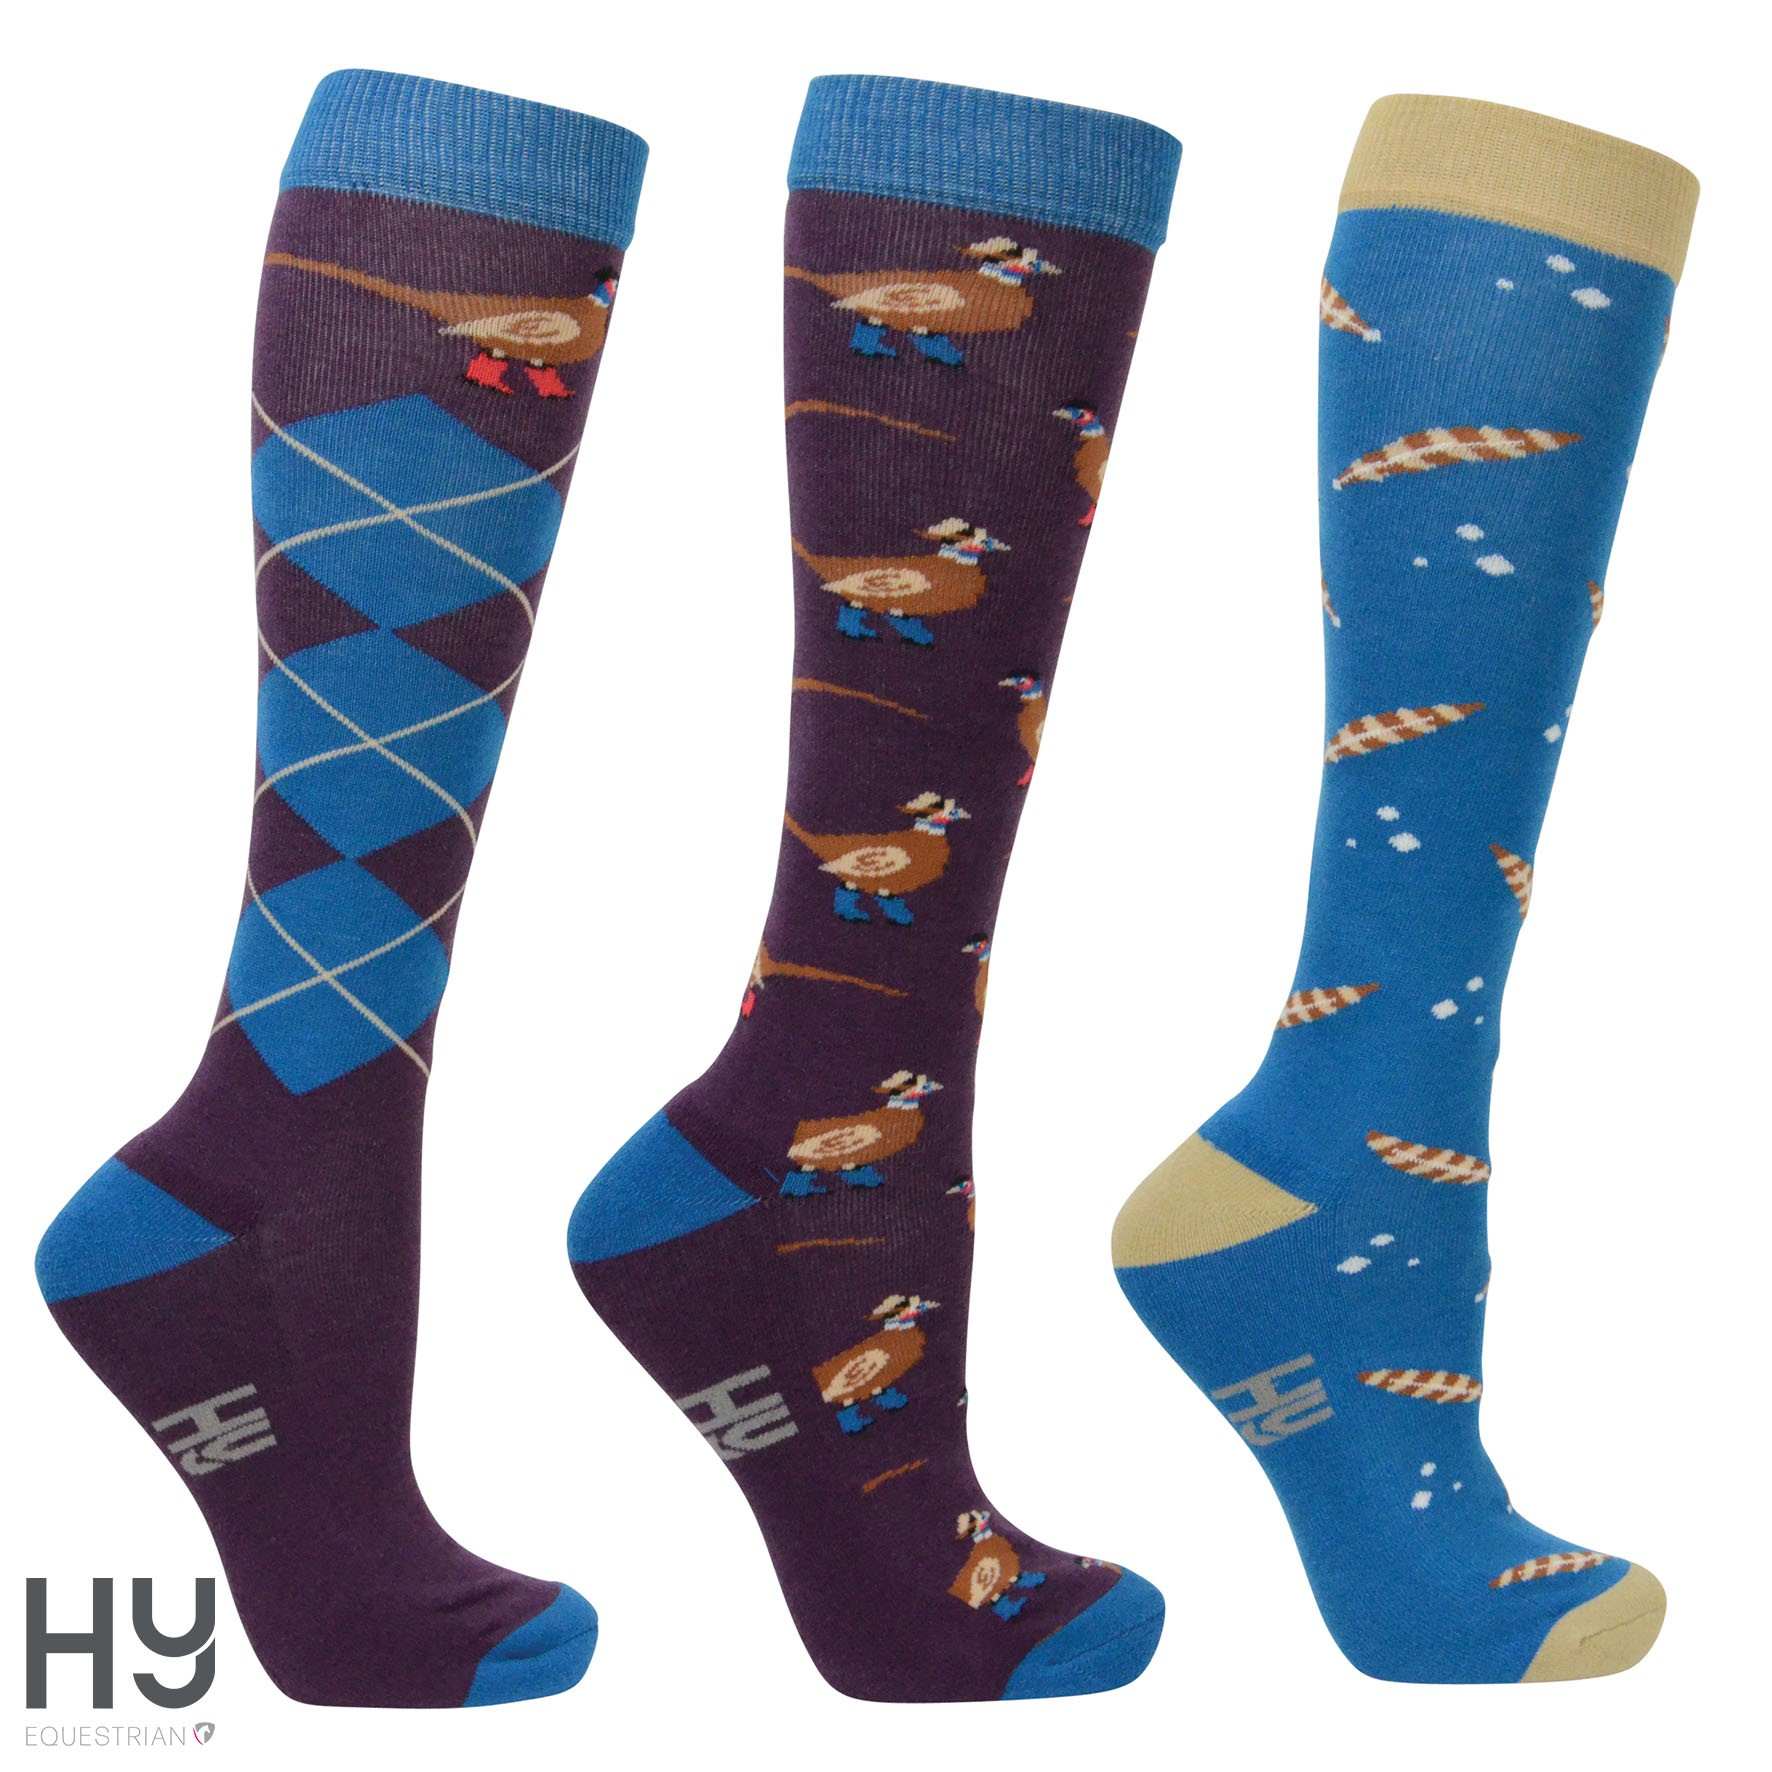 Hy Equestrian Patrick the Pheasant Socks